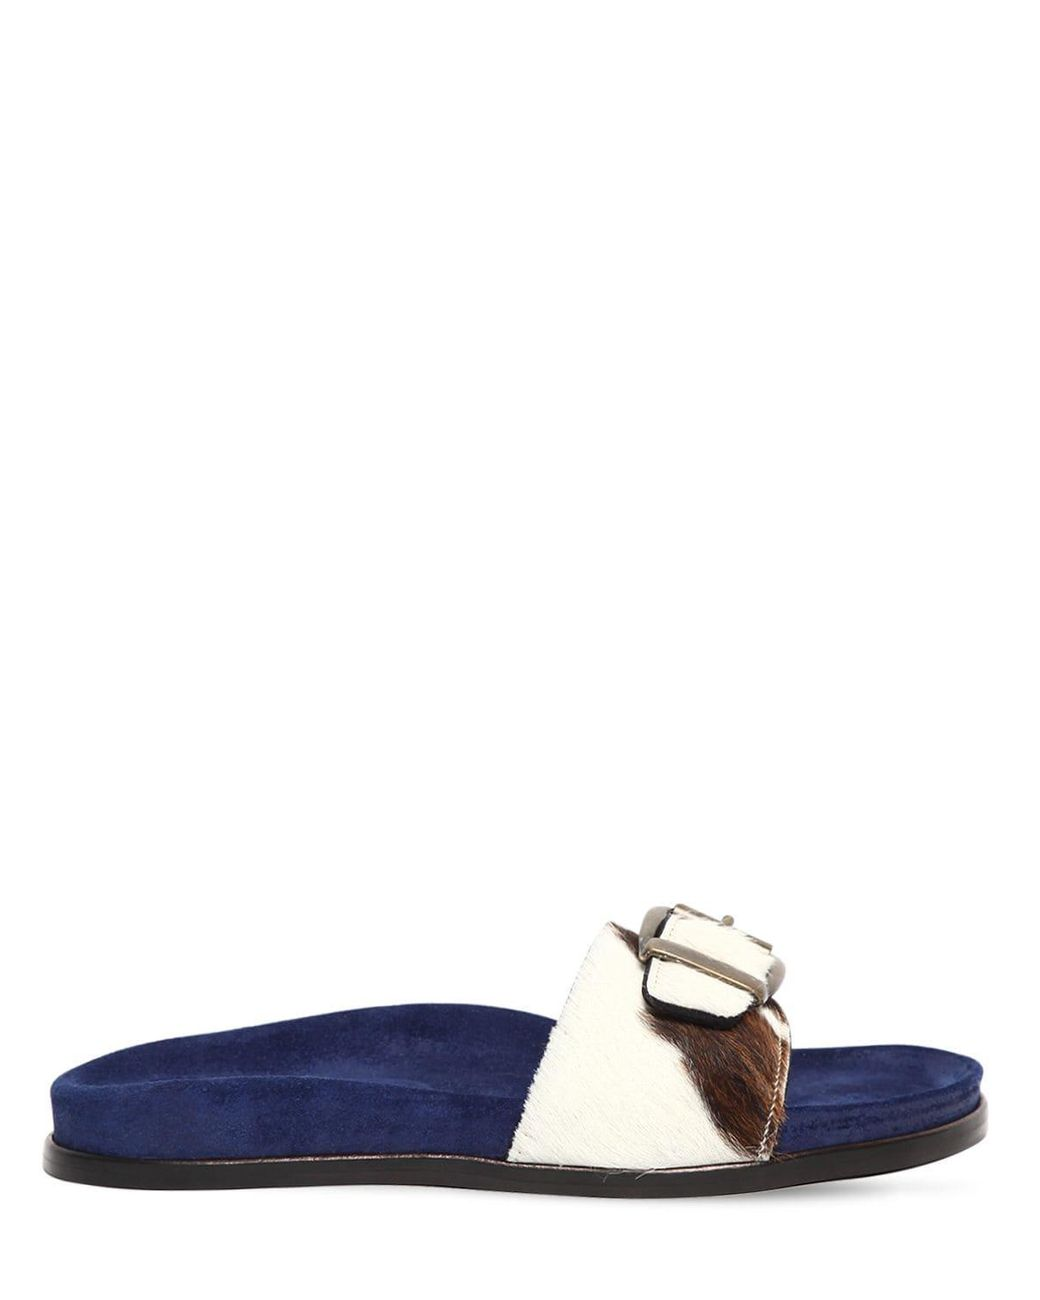 AVEC MODERATION Womens Bora Bora Leather Pony Hair Slide Sandals